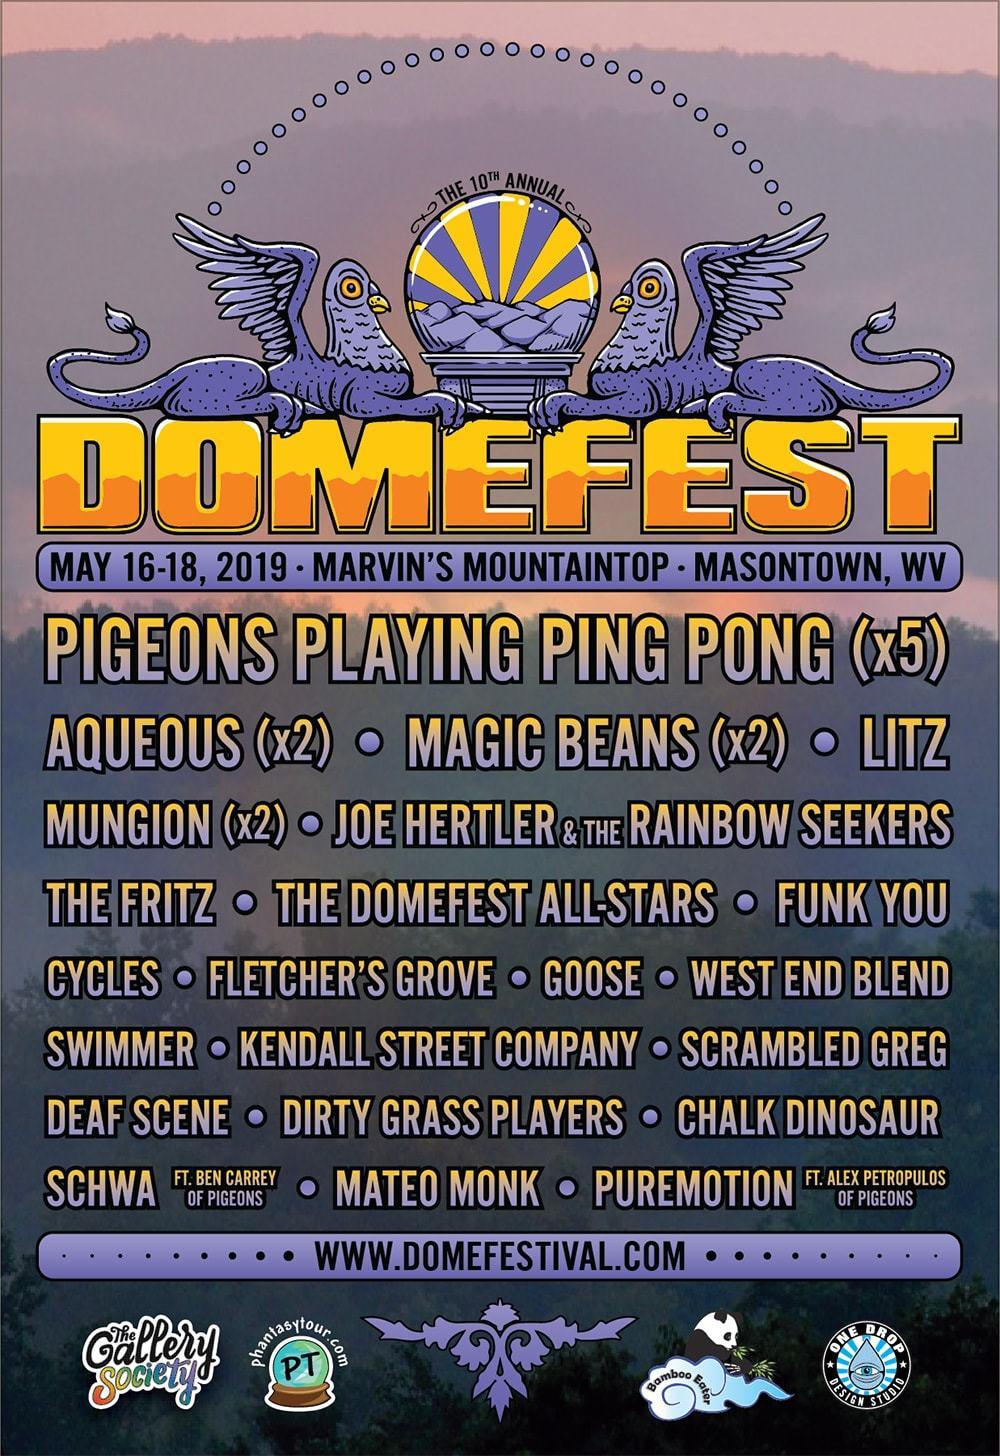 Domefest 2019 - Final Lineup